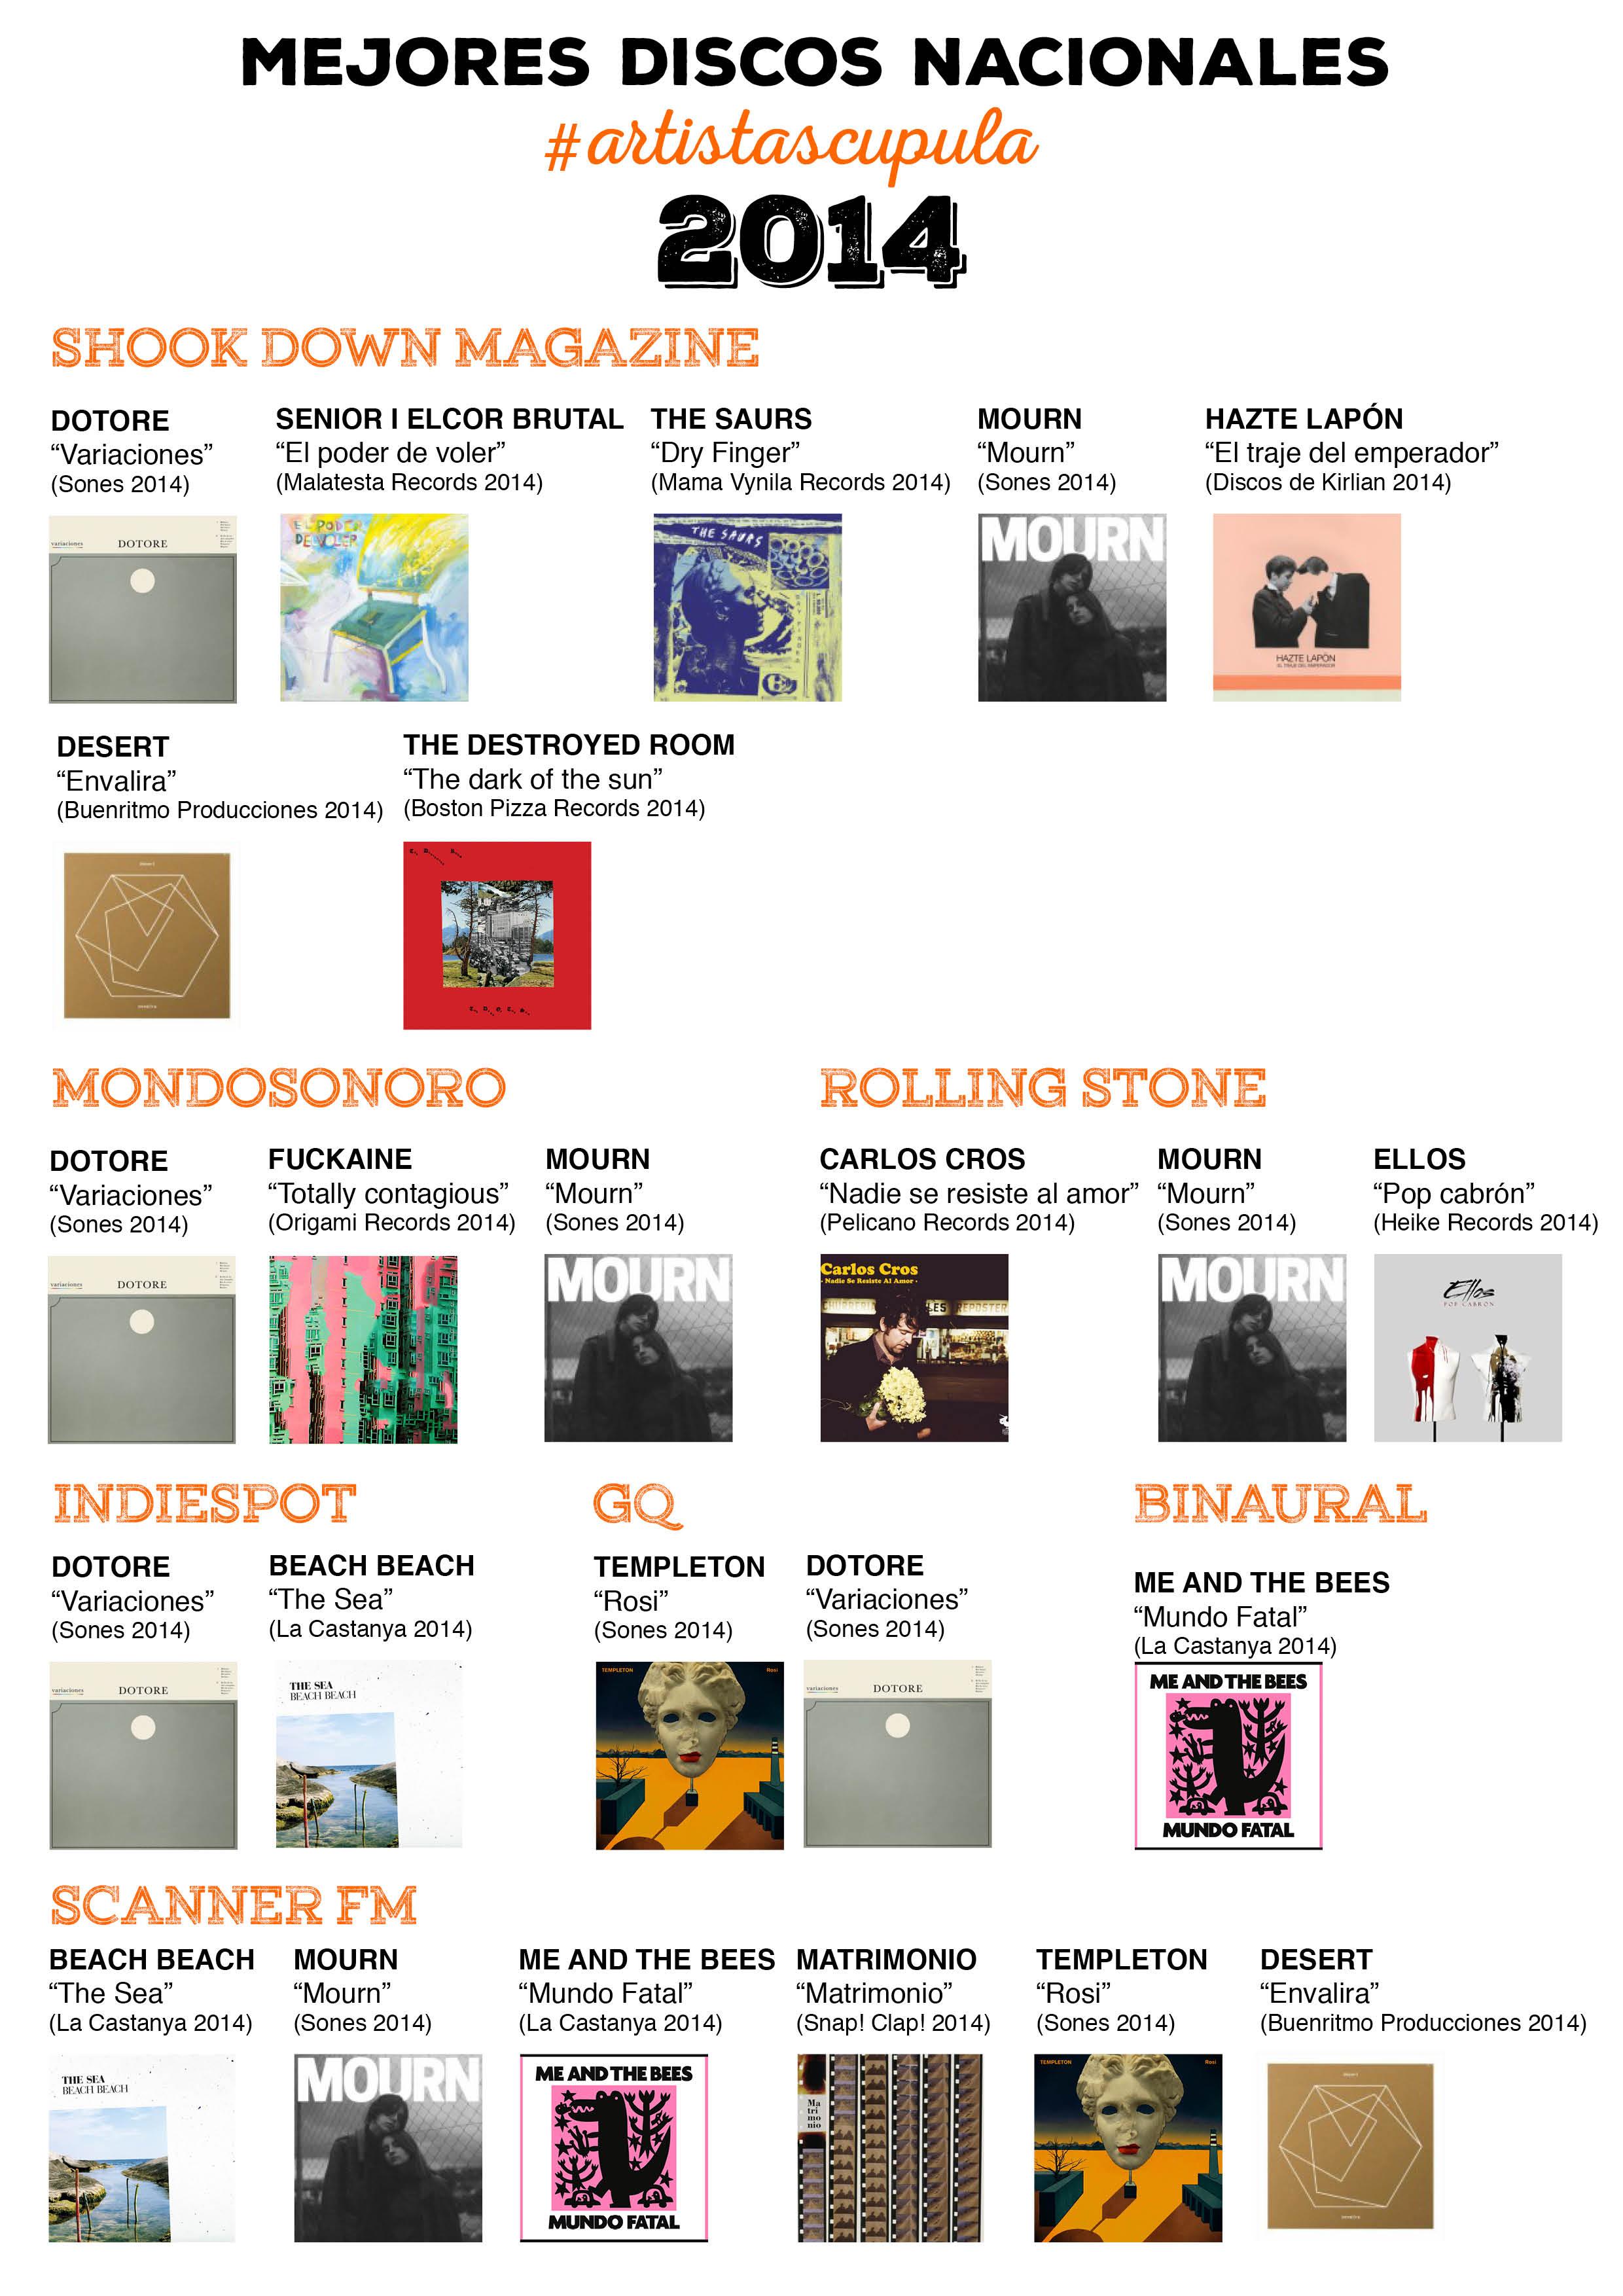 Mejores discos del 2014 #artistascupula